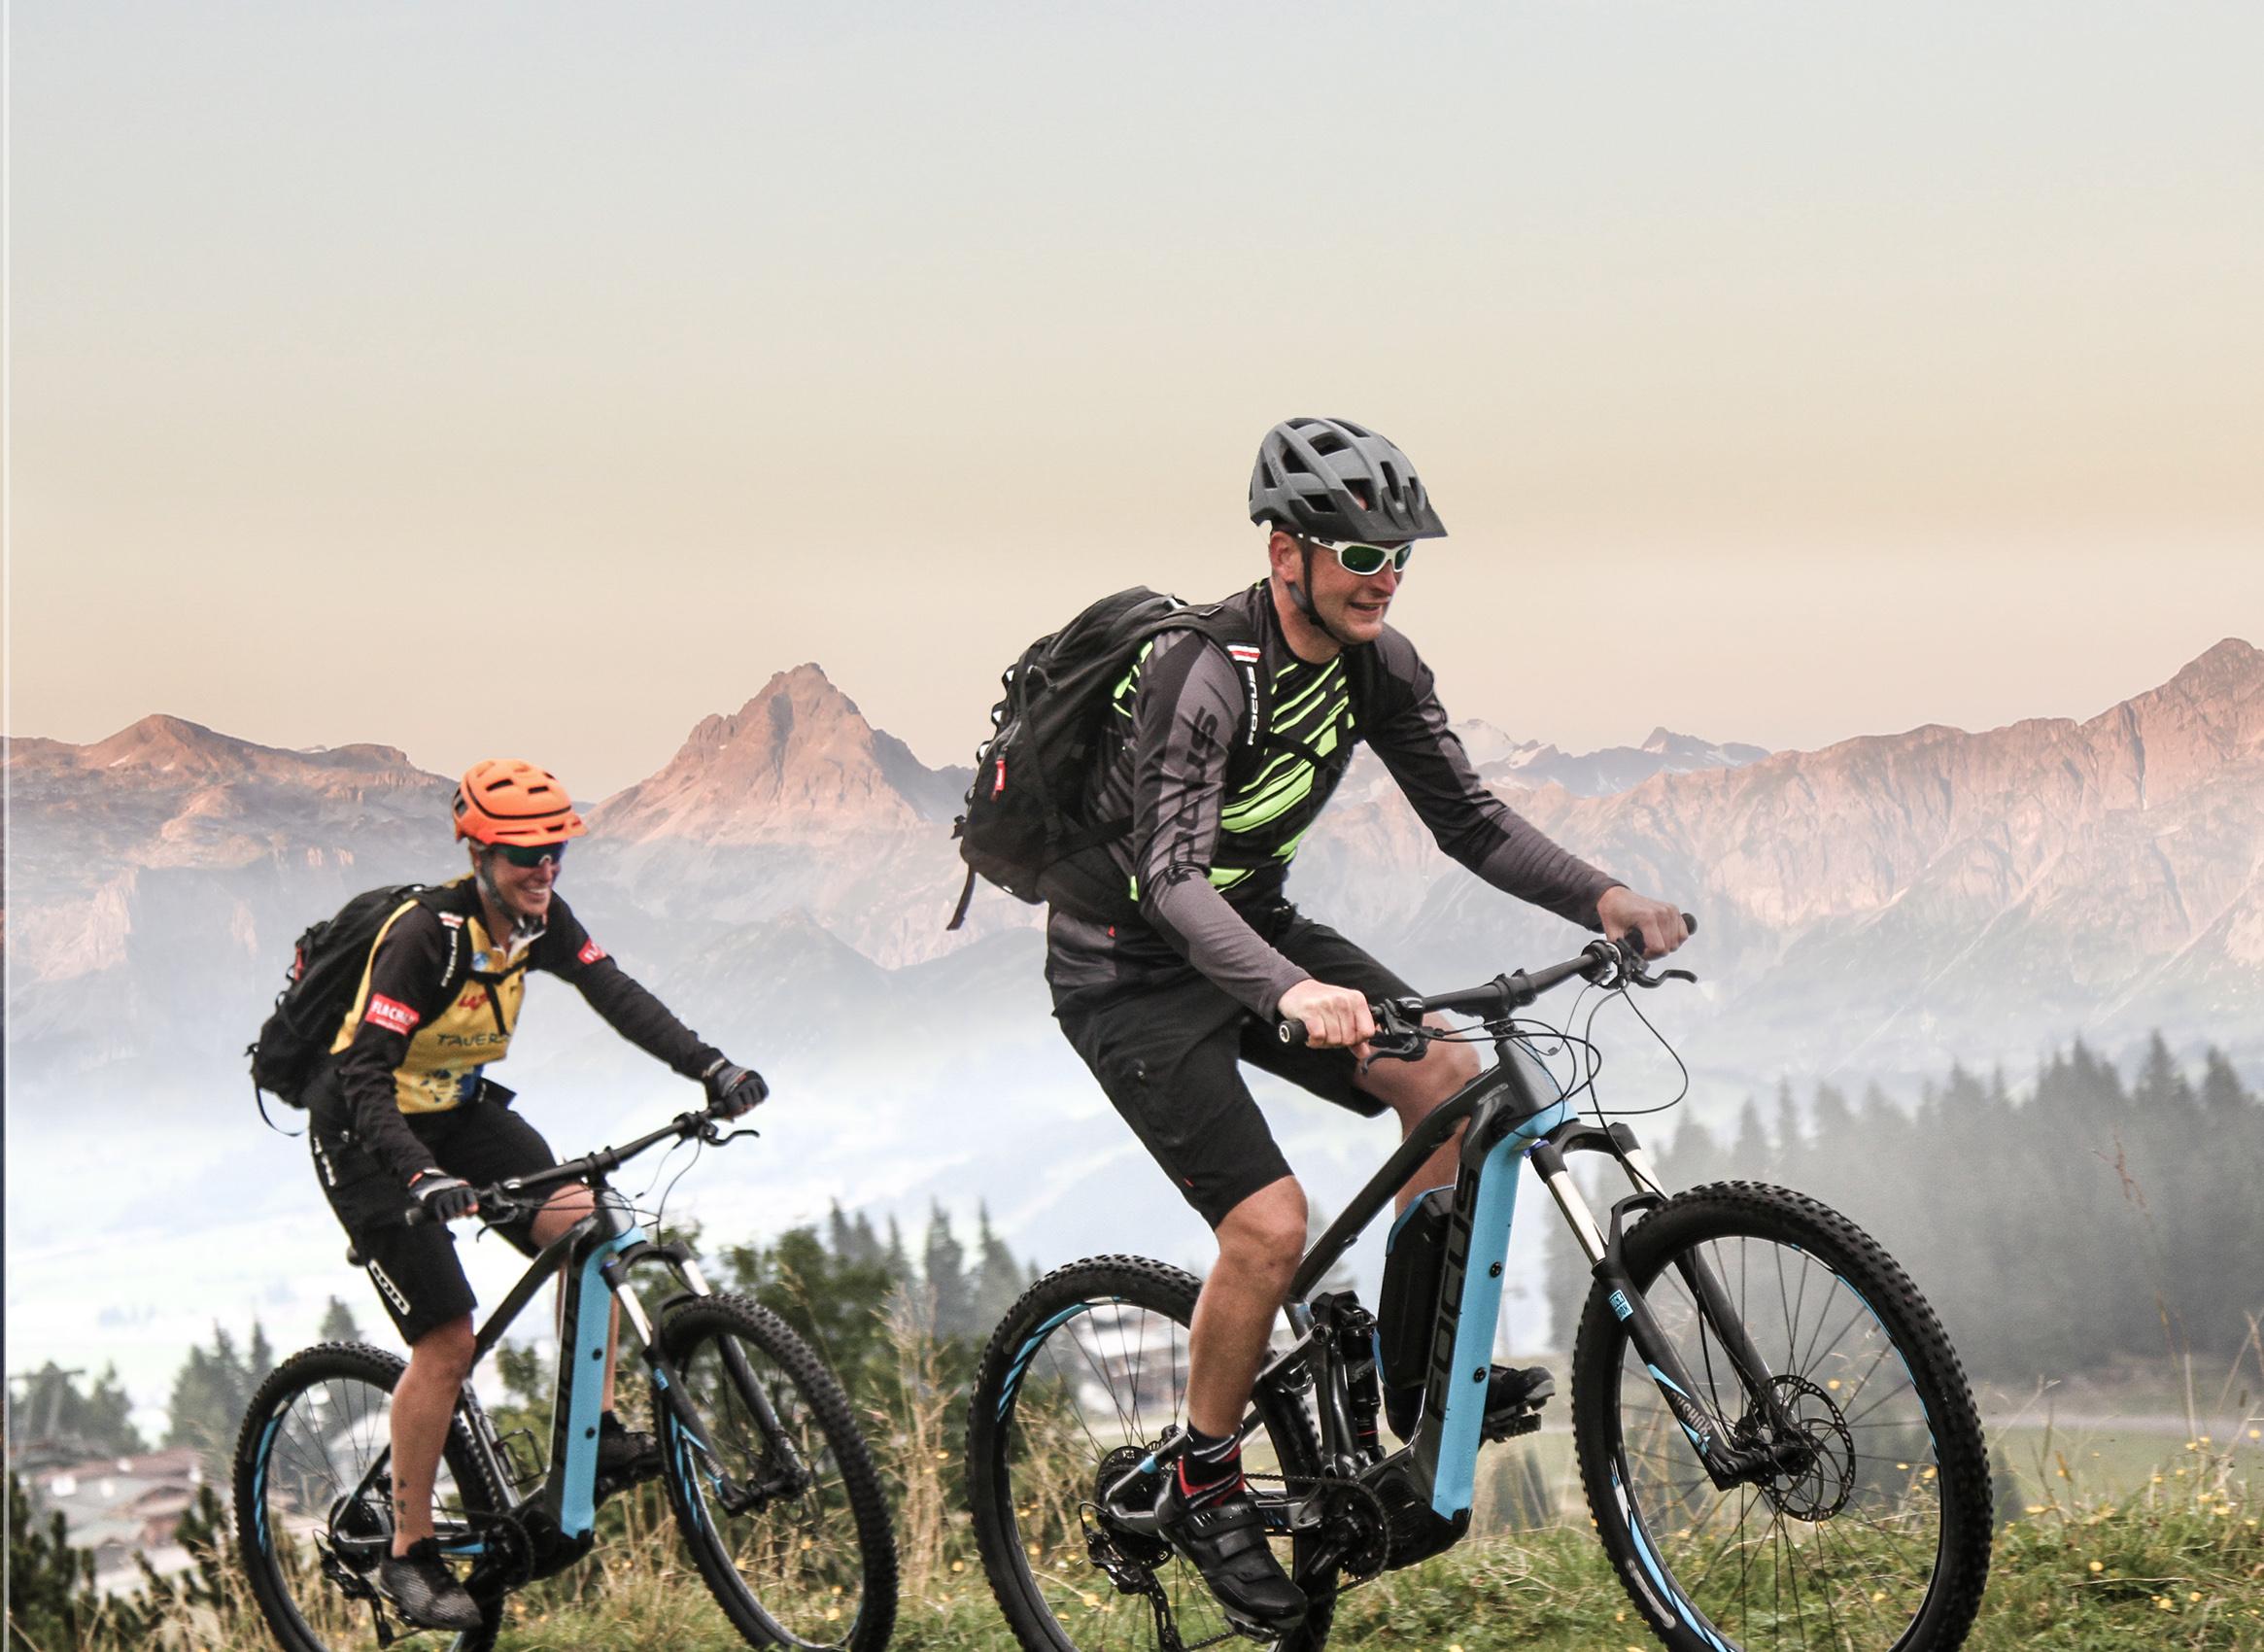 Biketechnik Flachau Bikehotel Tauernhof